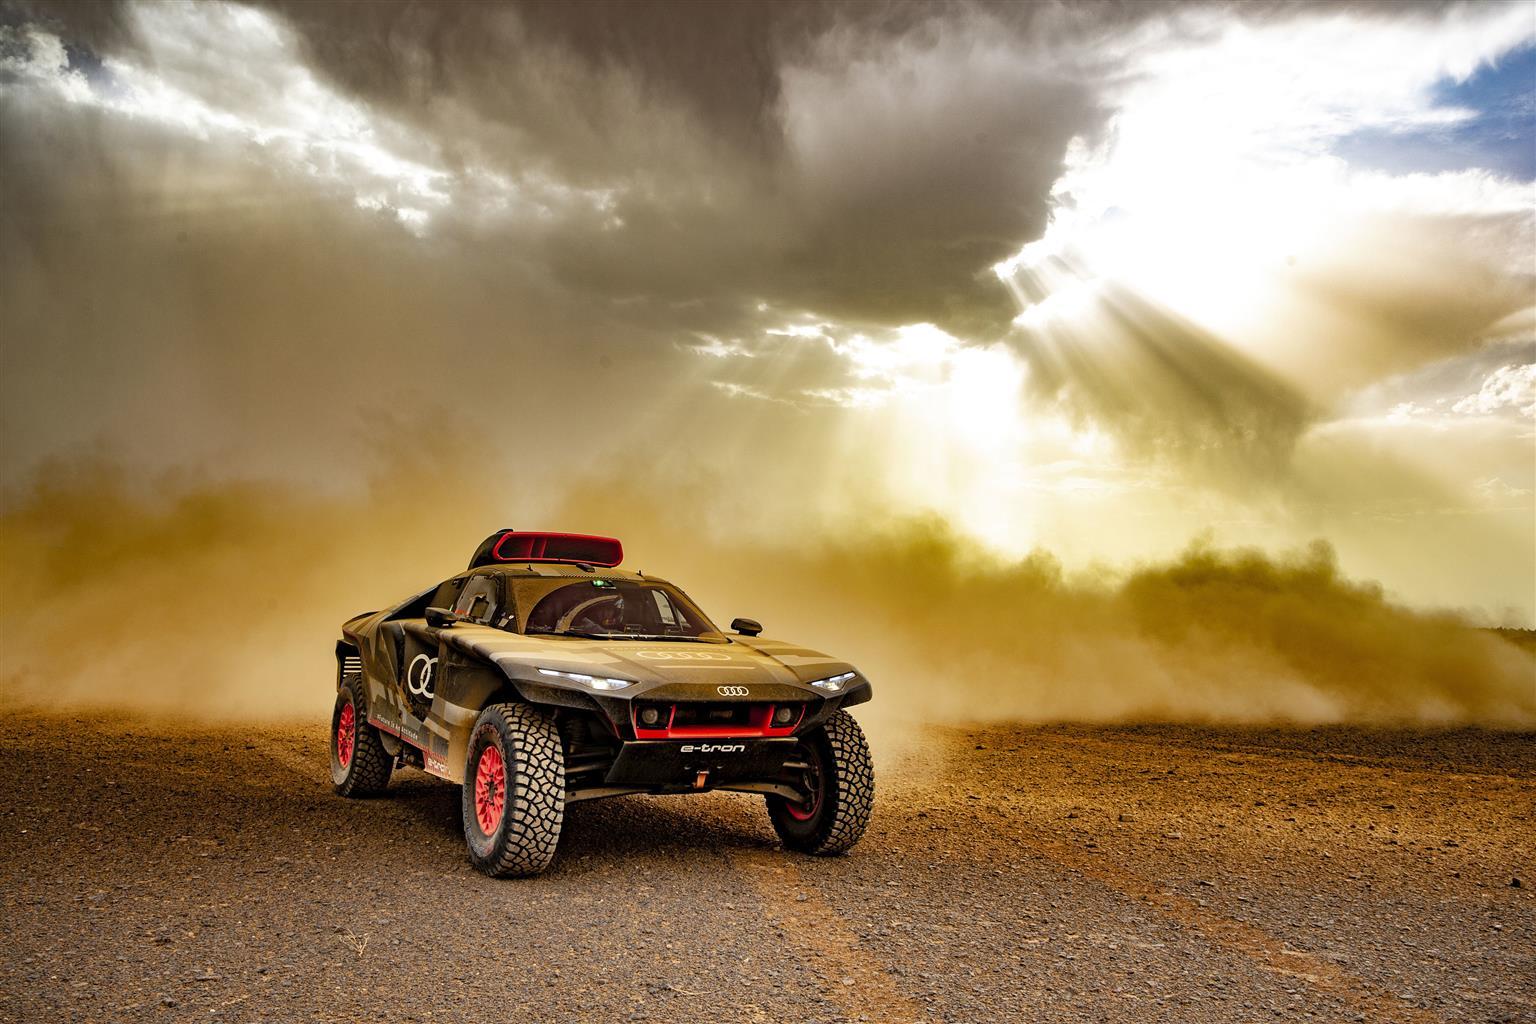 media-Audi RS Q e-tron@Marocco --- VGI U.O. Responsabile VA-5 Data di Creazione 20.09.2021 Classe 9.1_009